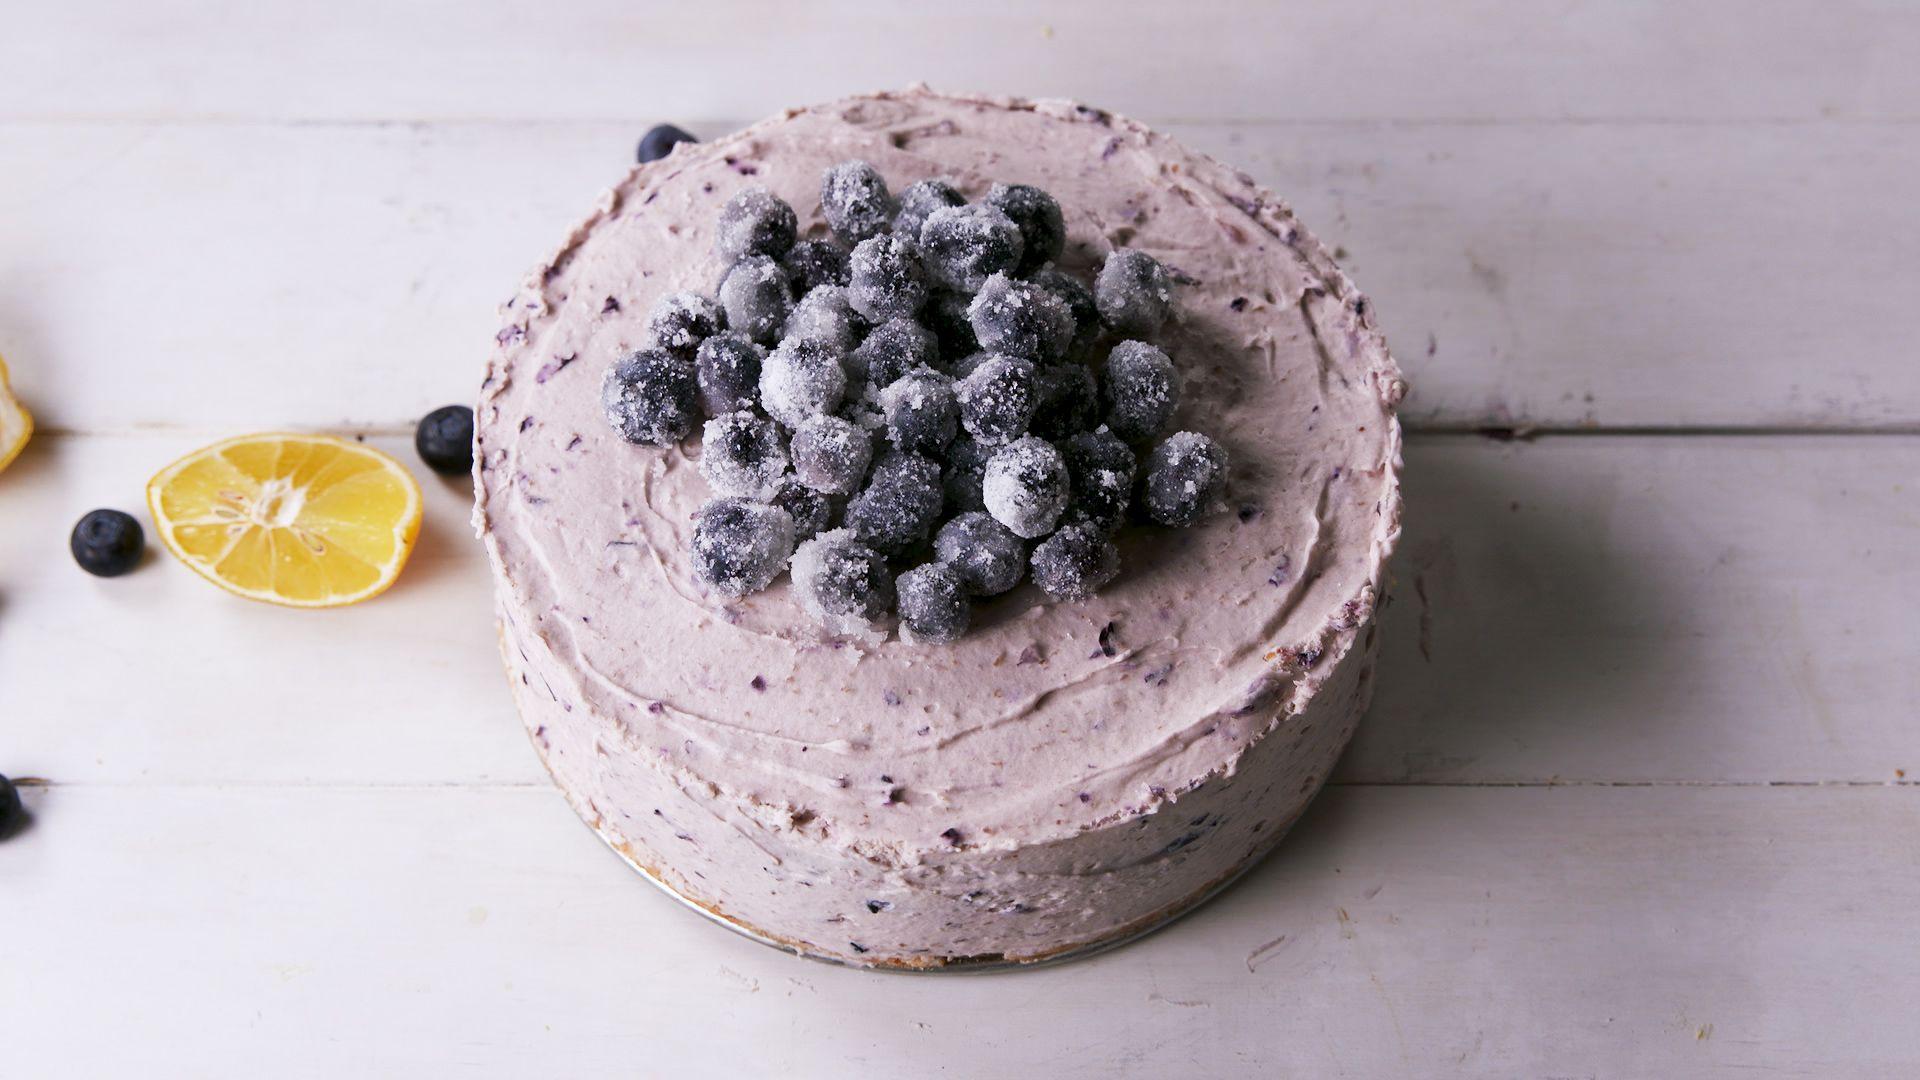 Blueberry Chocolate Buttermilk Cake